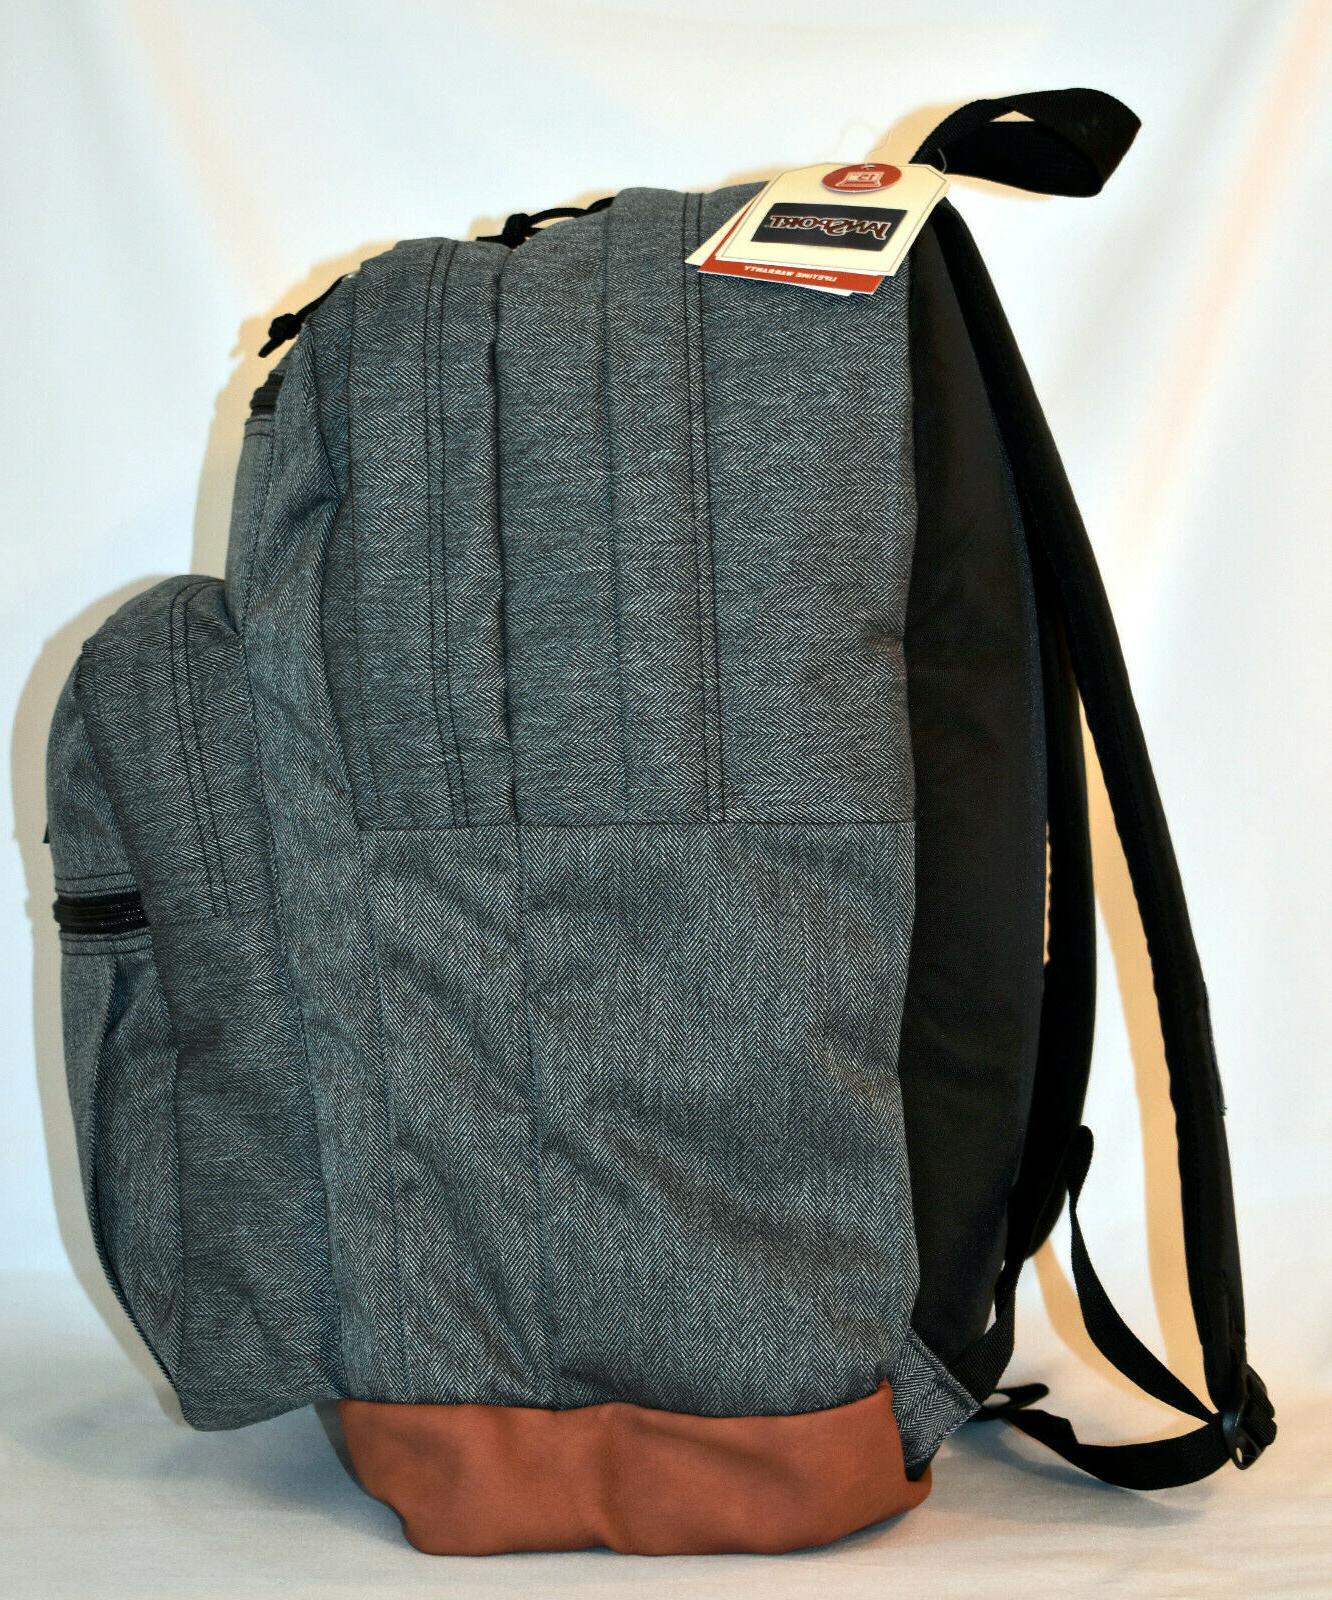 New Student Laptop Backpack White Herringbone